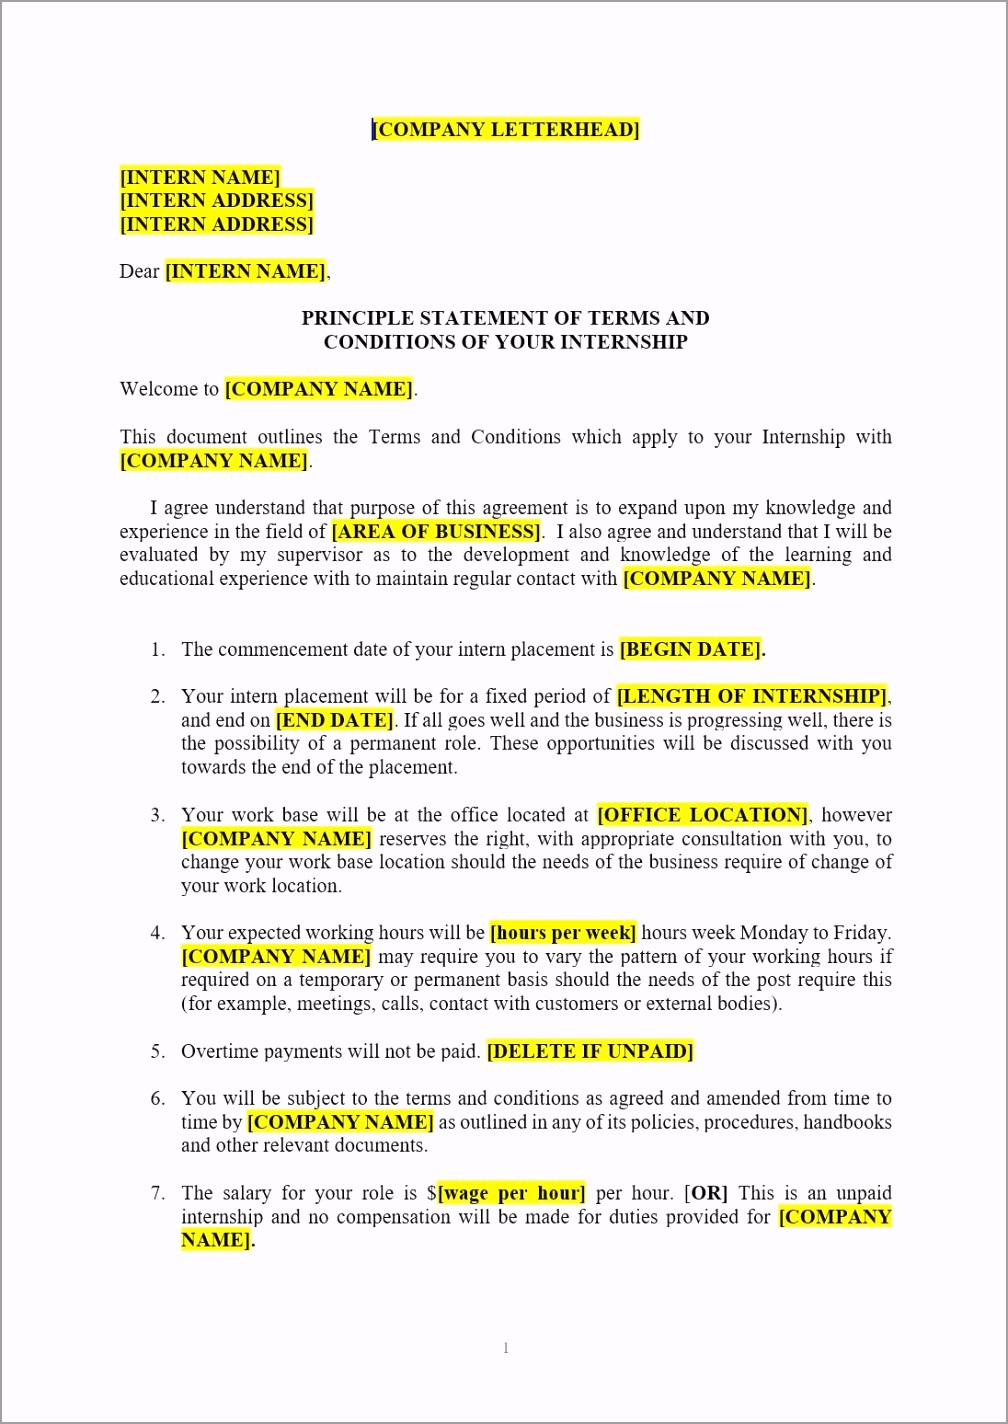 internship agreement template image owiut